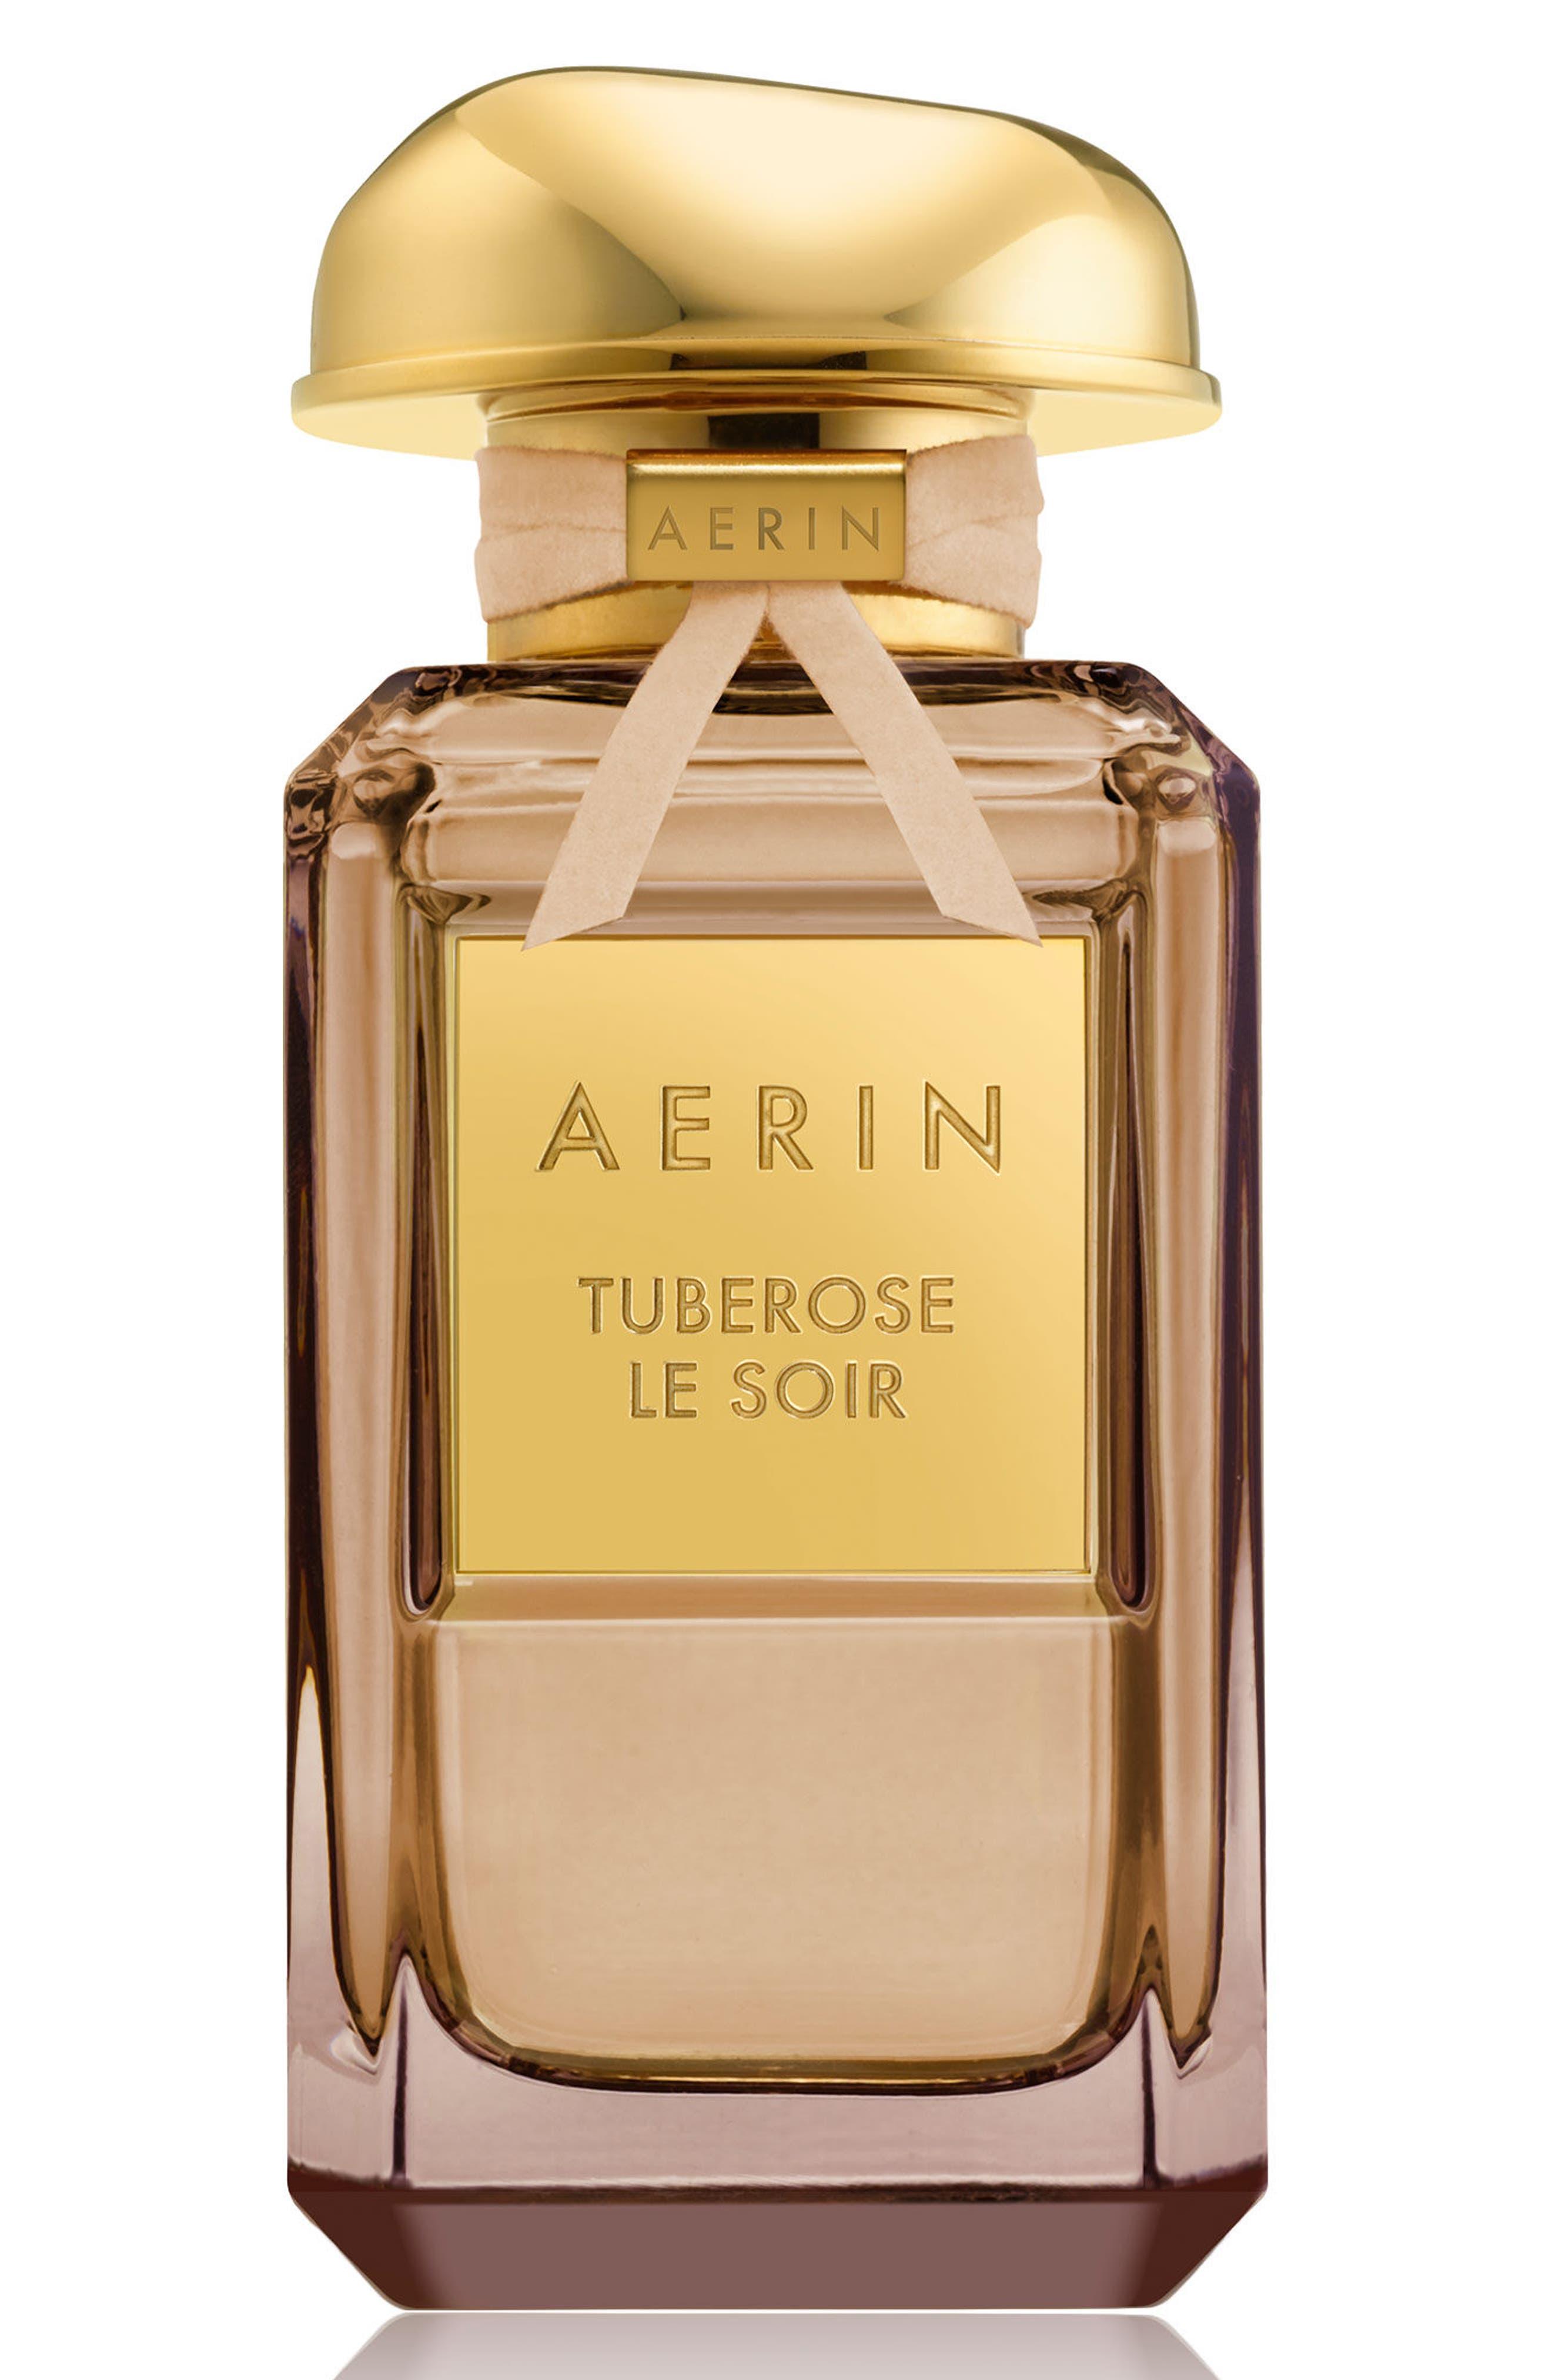 Aerin Beauty Tuberose Parfum